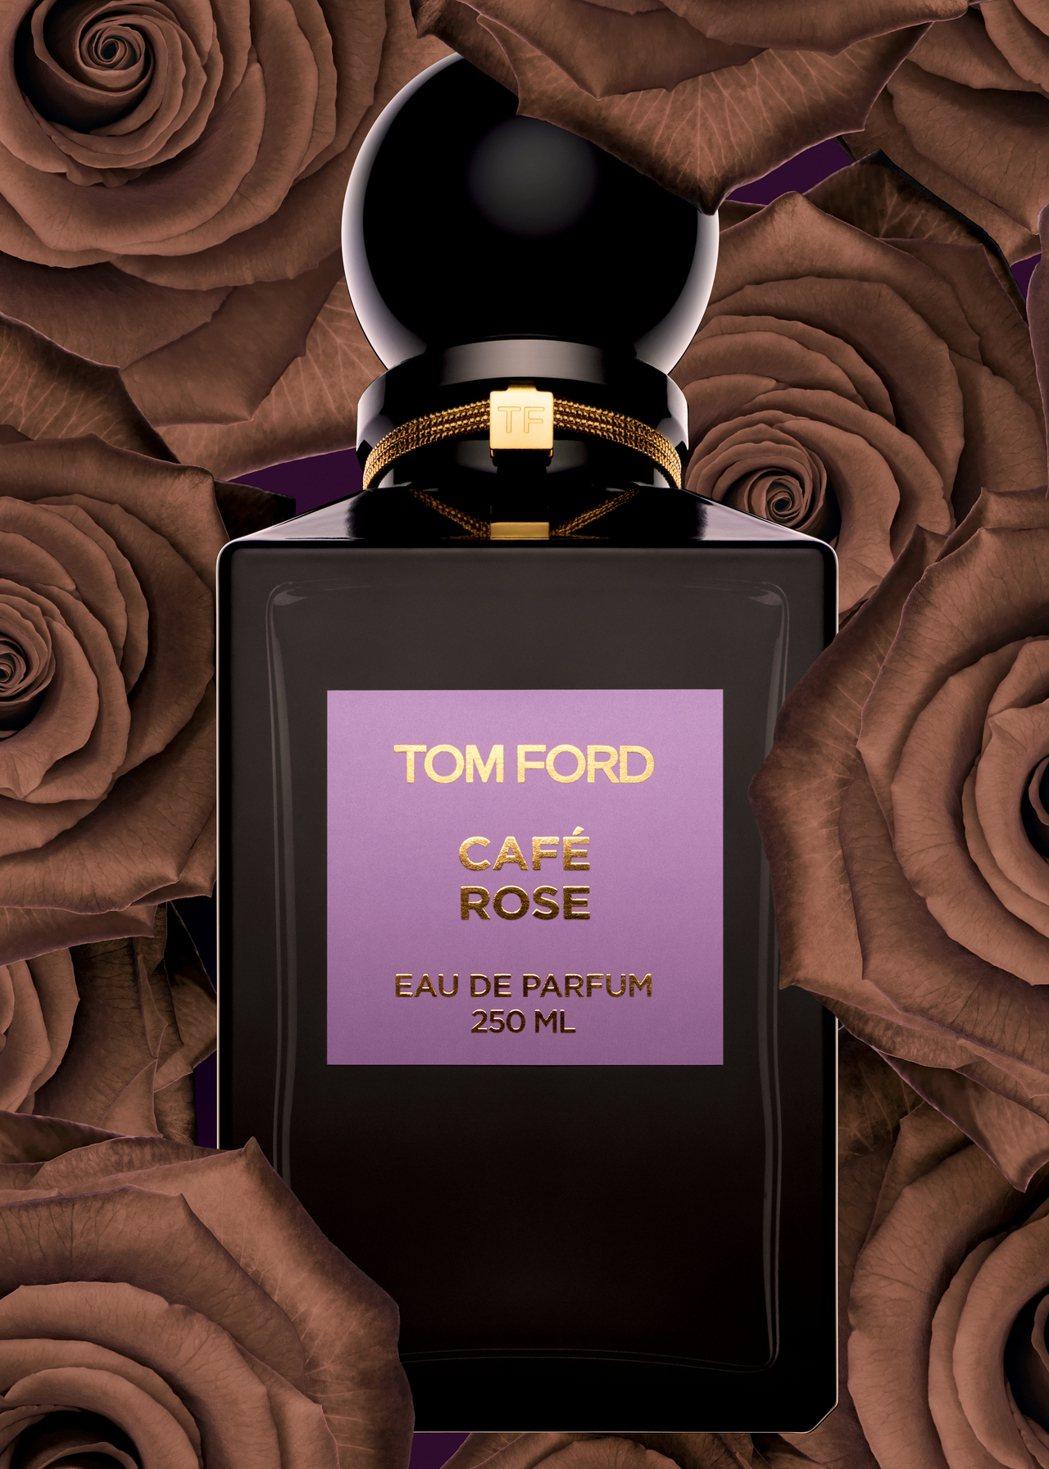 TOM FORD Private Blend私人調香系列則是專為熱愛香氛的鑑賞家...